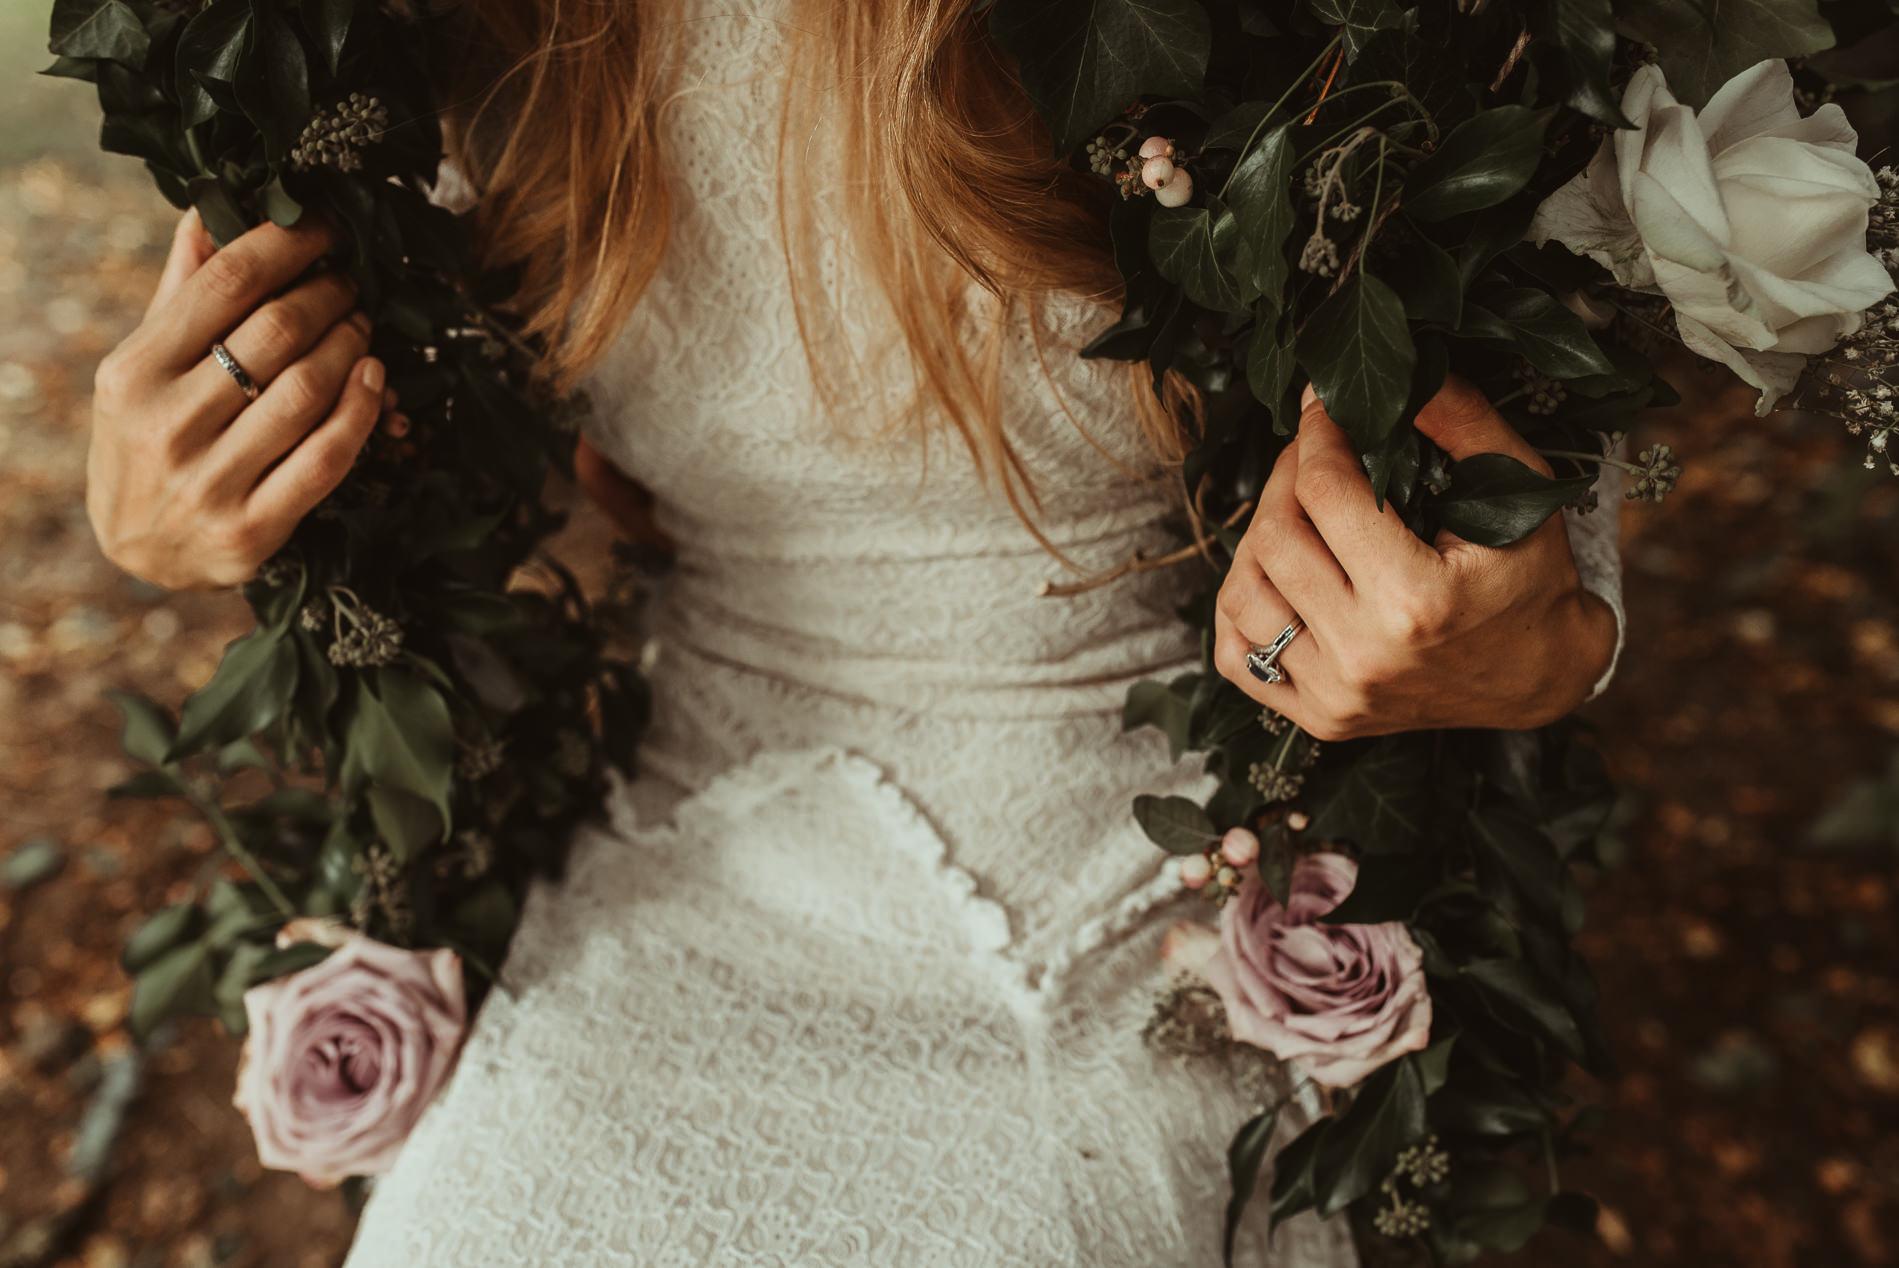 bohemian_wedding_lawshall_church_garden59